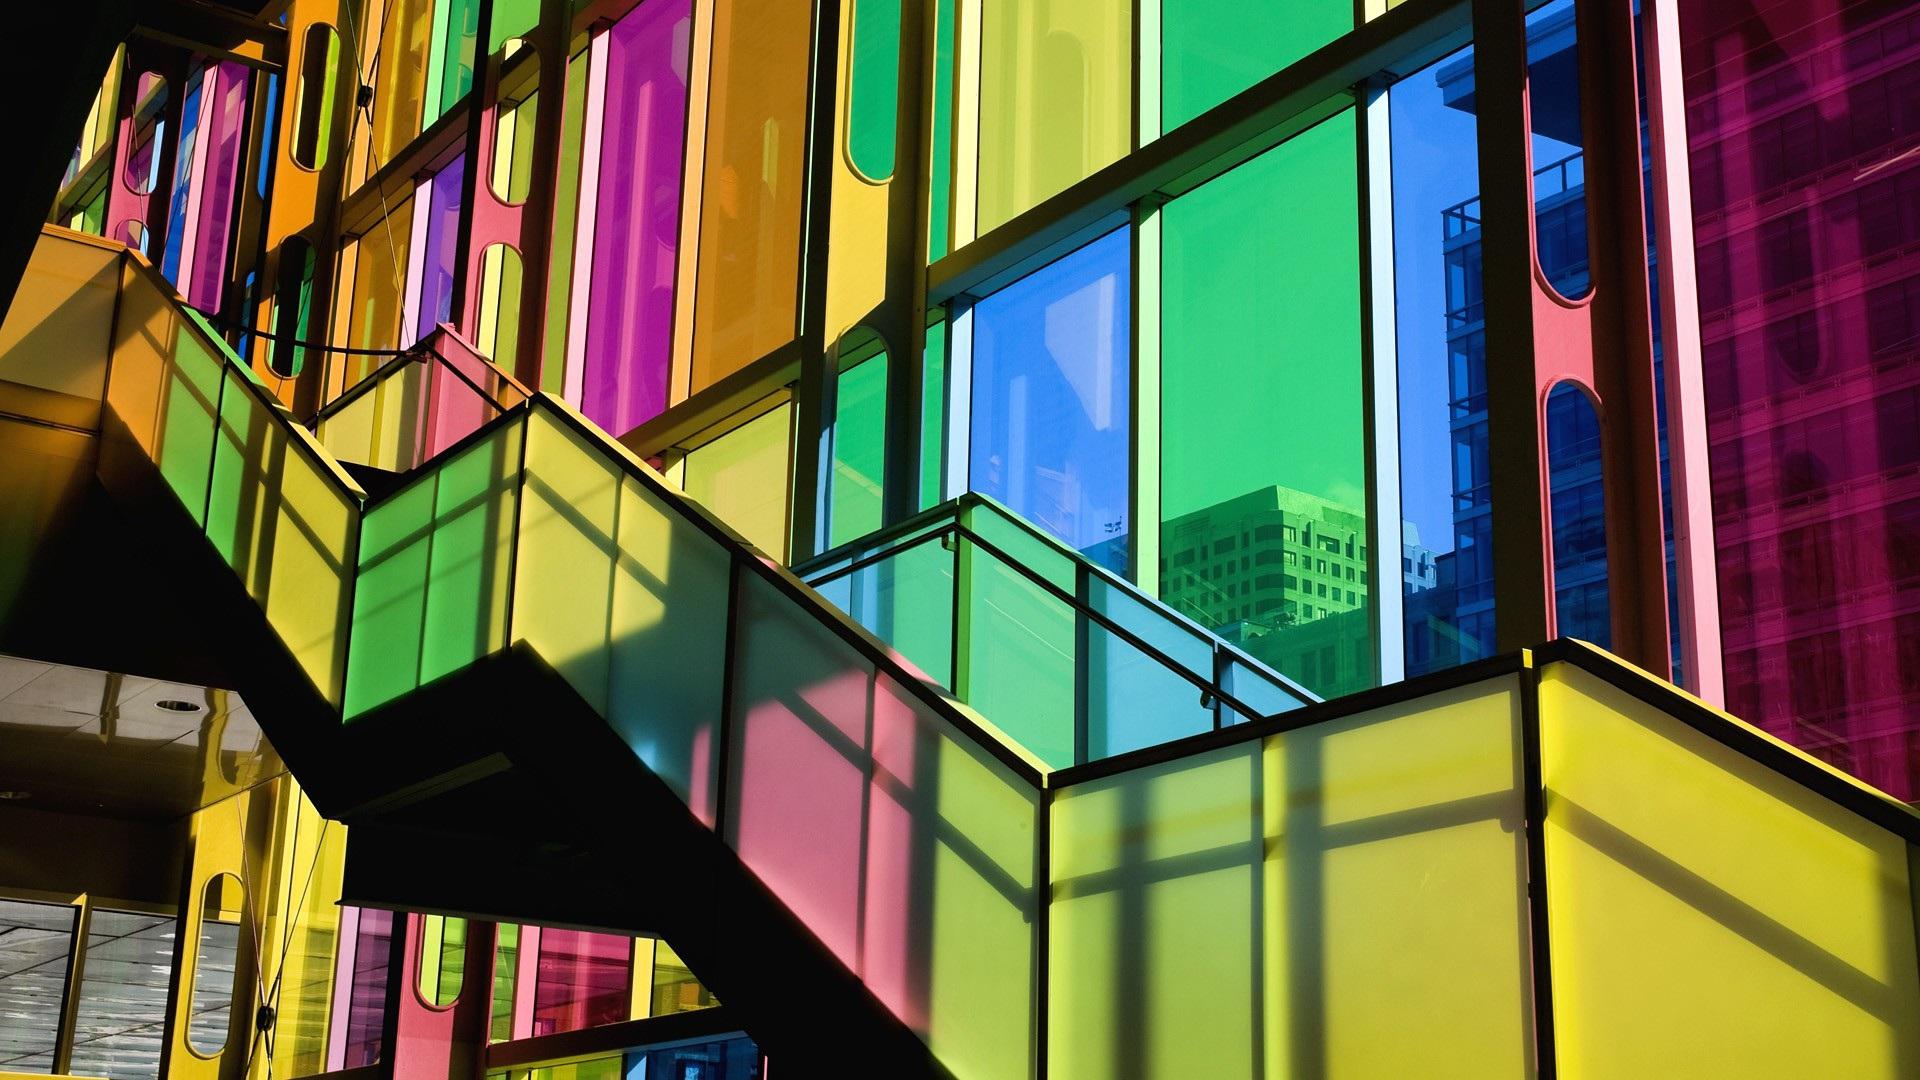 download glass buildings wallpaper - photo #20